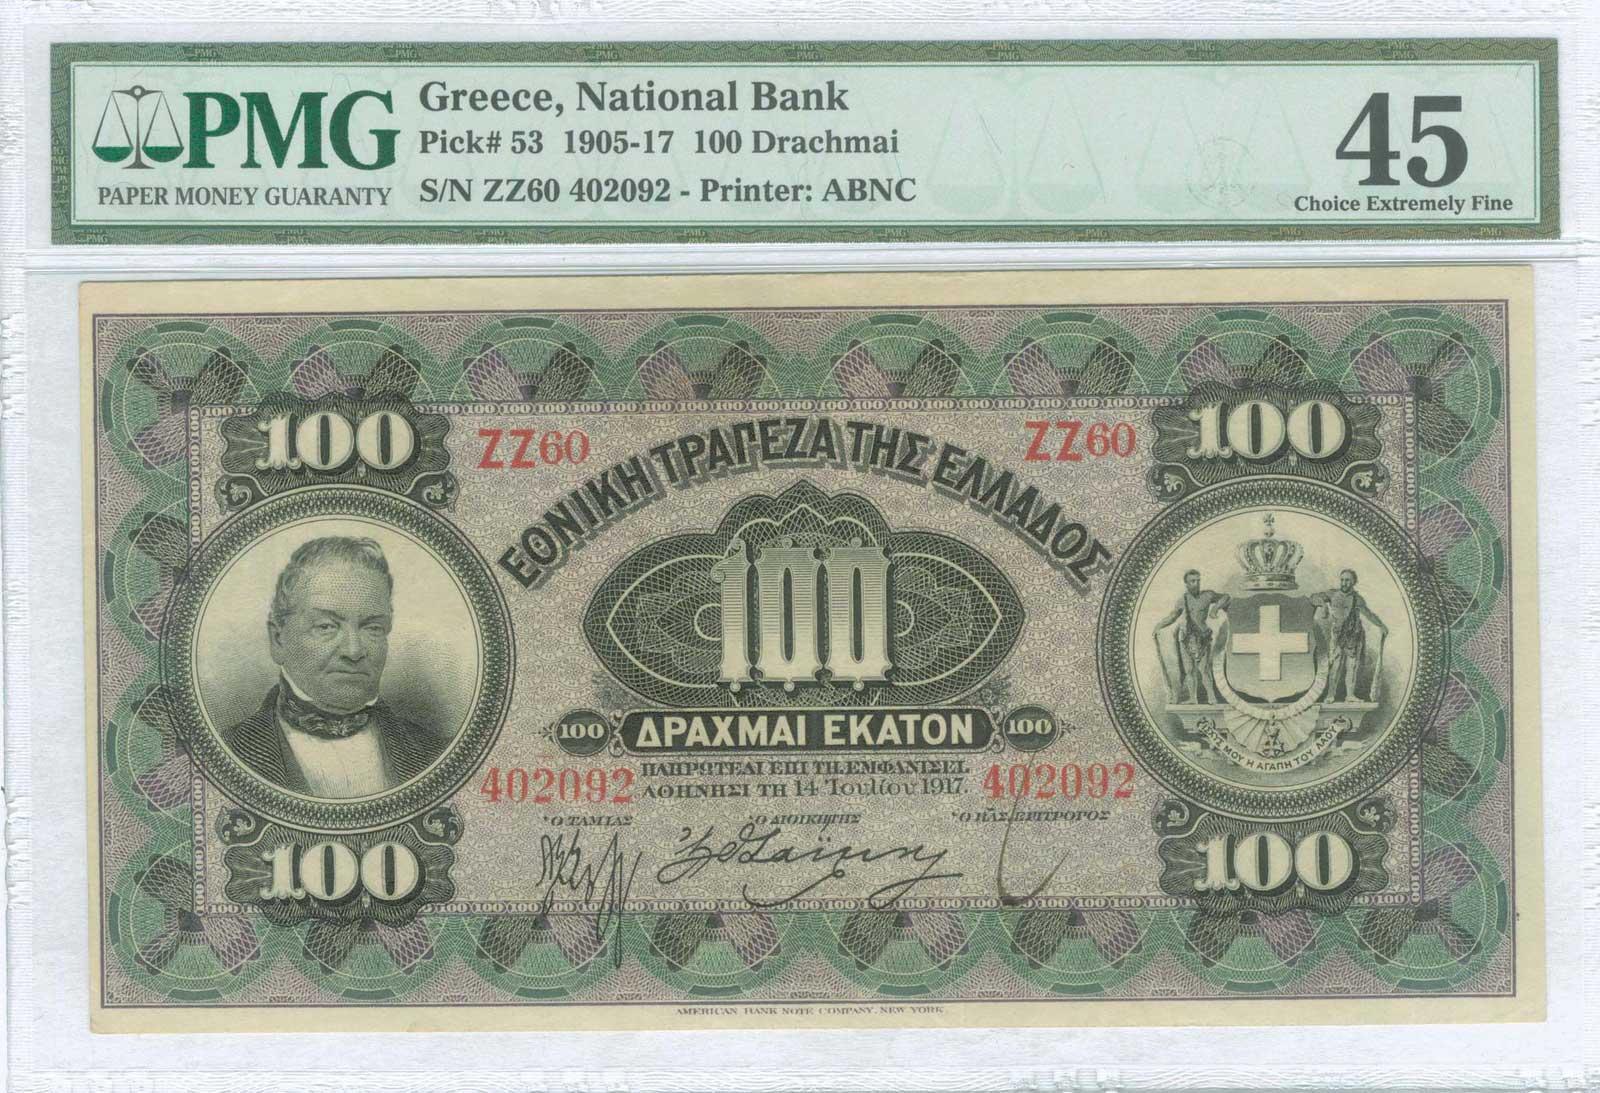 Lot 9262 - GREECE-  PAPER MONEY - BANKNOTES National Bank of Greece -  A. Karamitsos Public & LIVE Bid Auction 610 Coins, Medals & Banknotes